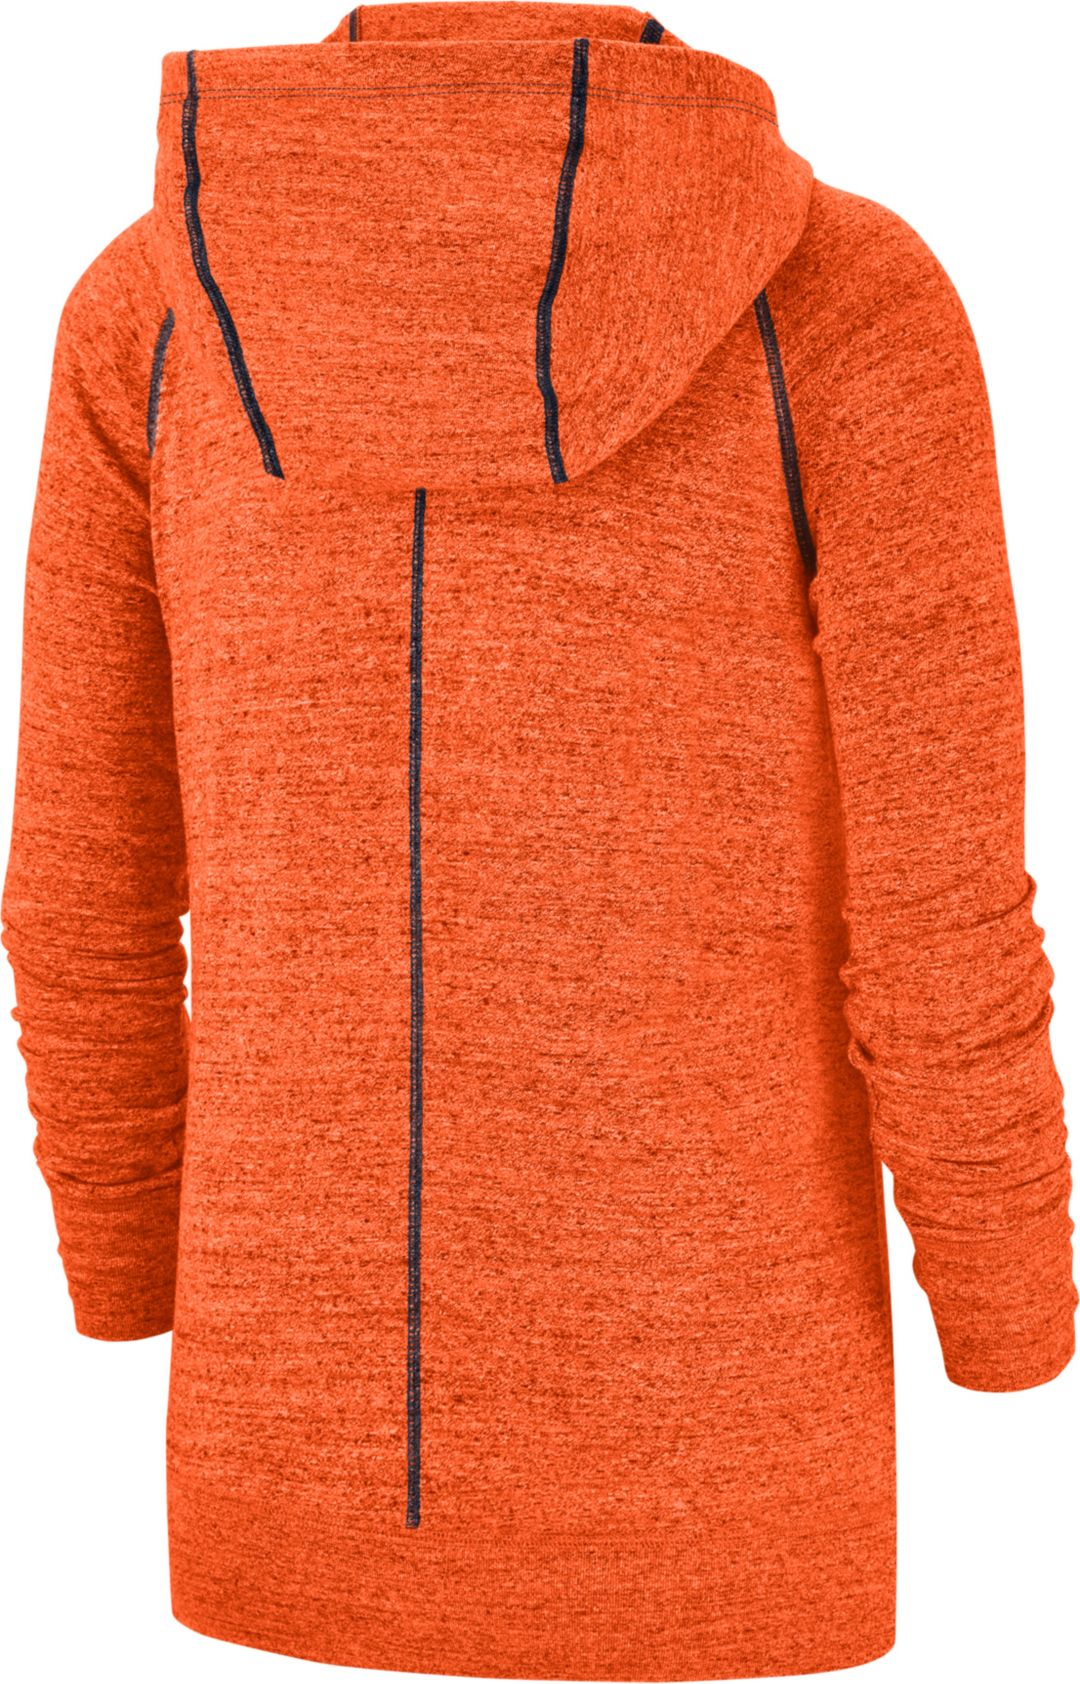 big sale 1e7a5 7fdd4 Nike Women's Denver Broncos Vintage Orange Full-Zip Hoodie